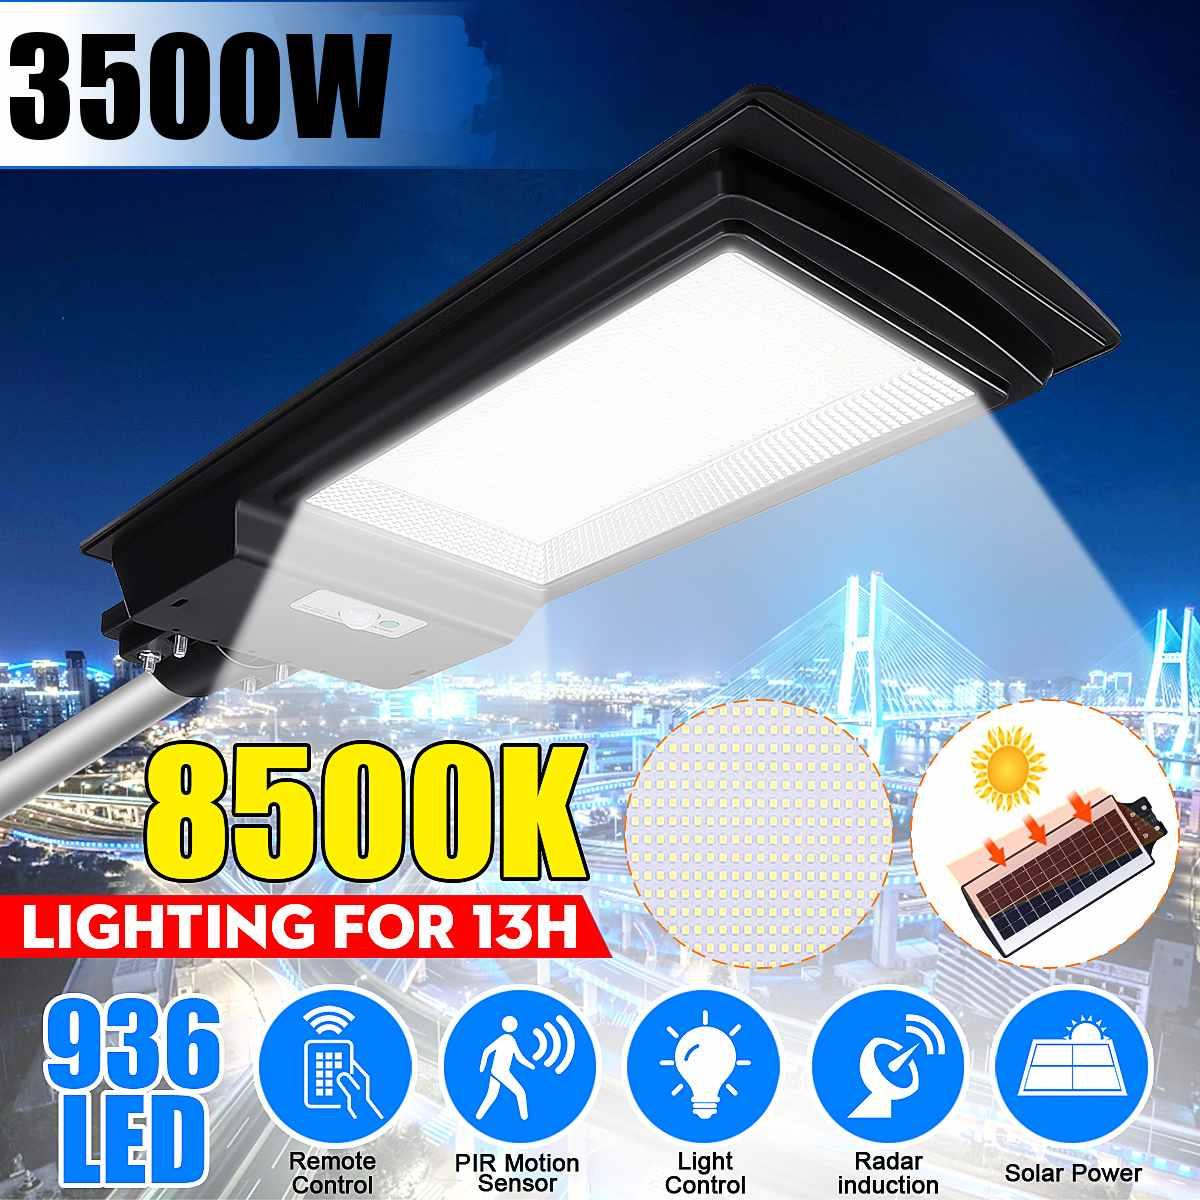 3500W IP65 LED Solar Street Light 436/936LED 8500K Light Radar Motion Sensor Wall Timing Lamp Remote Control Garden Outdoor Lamp